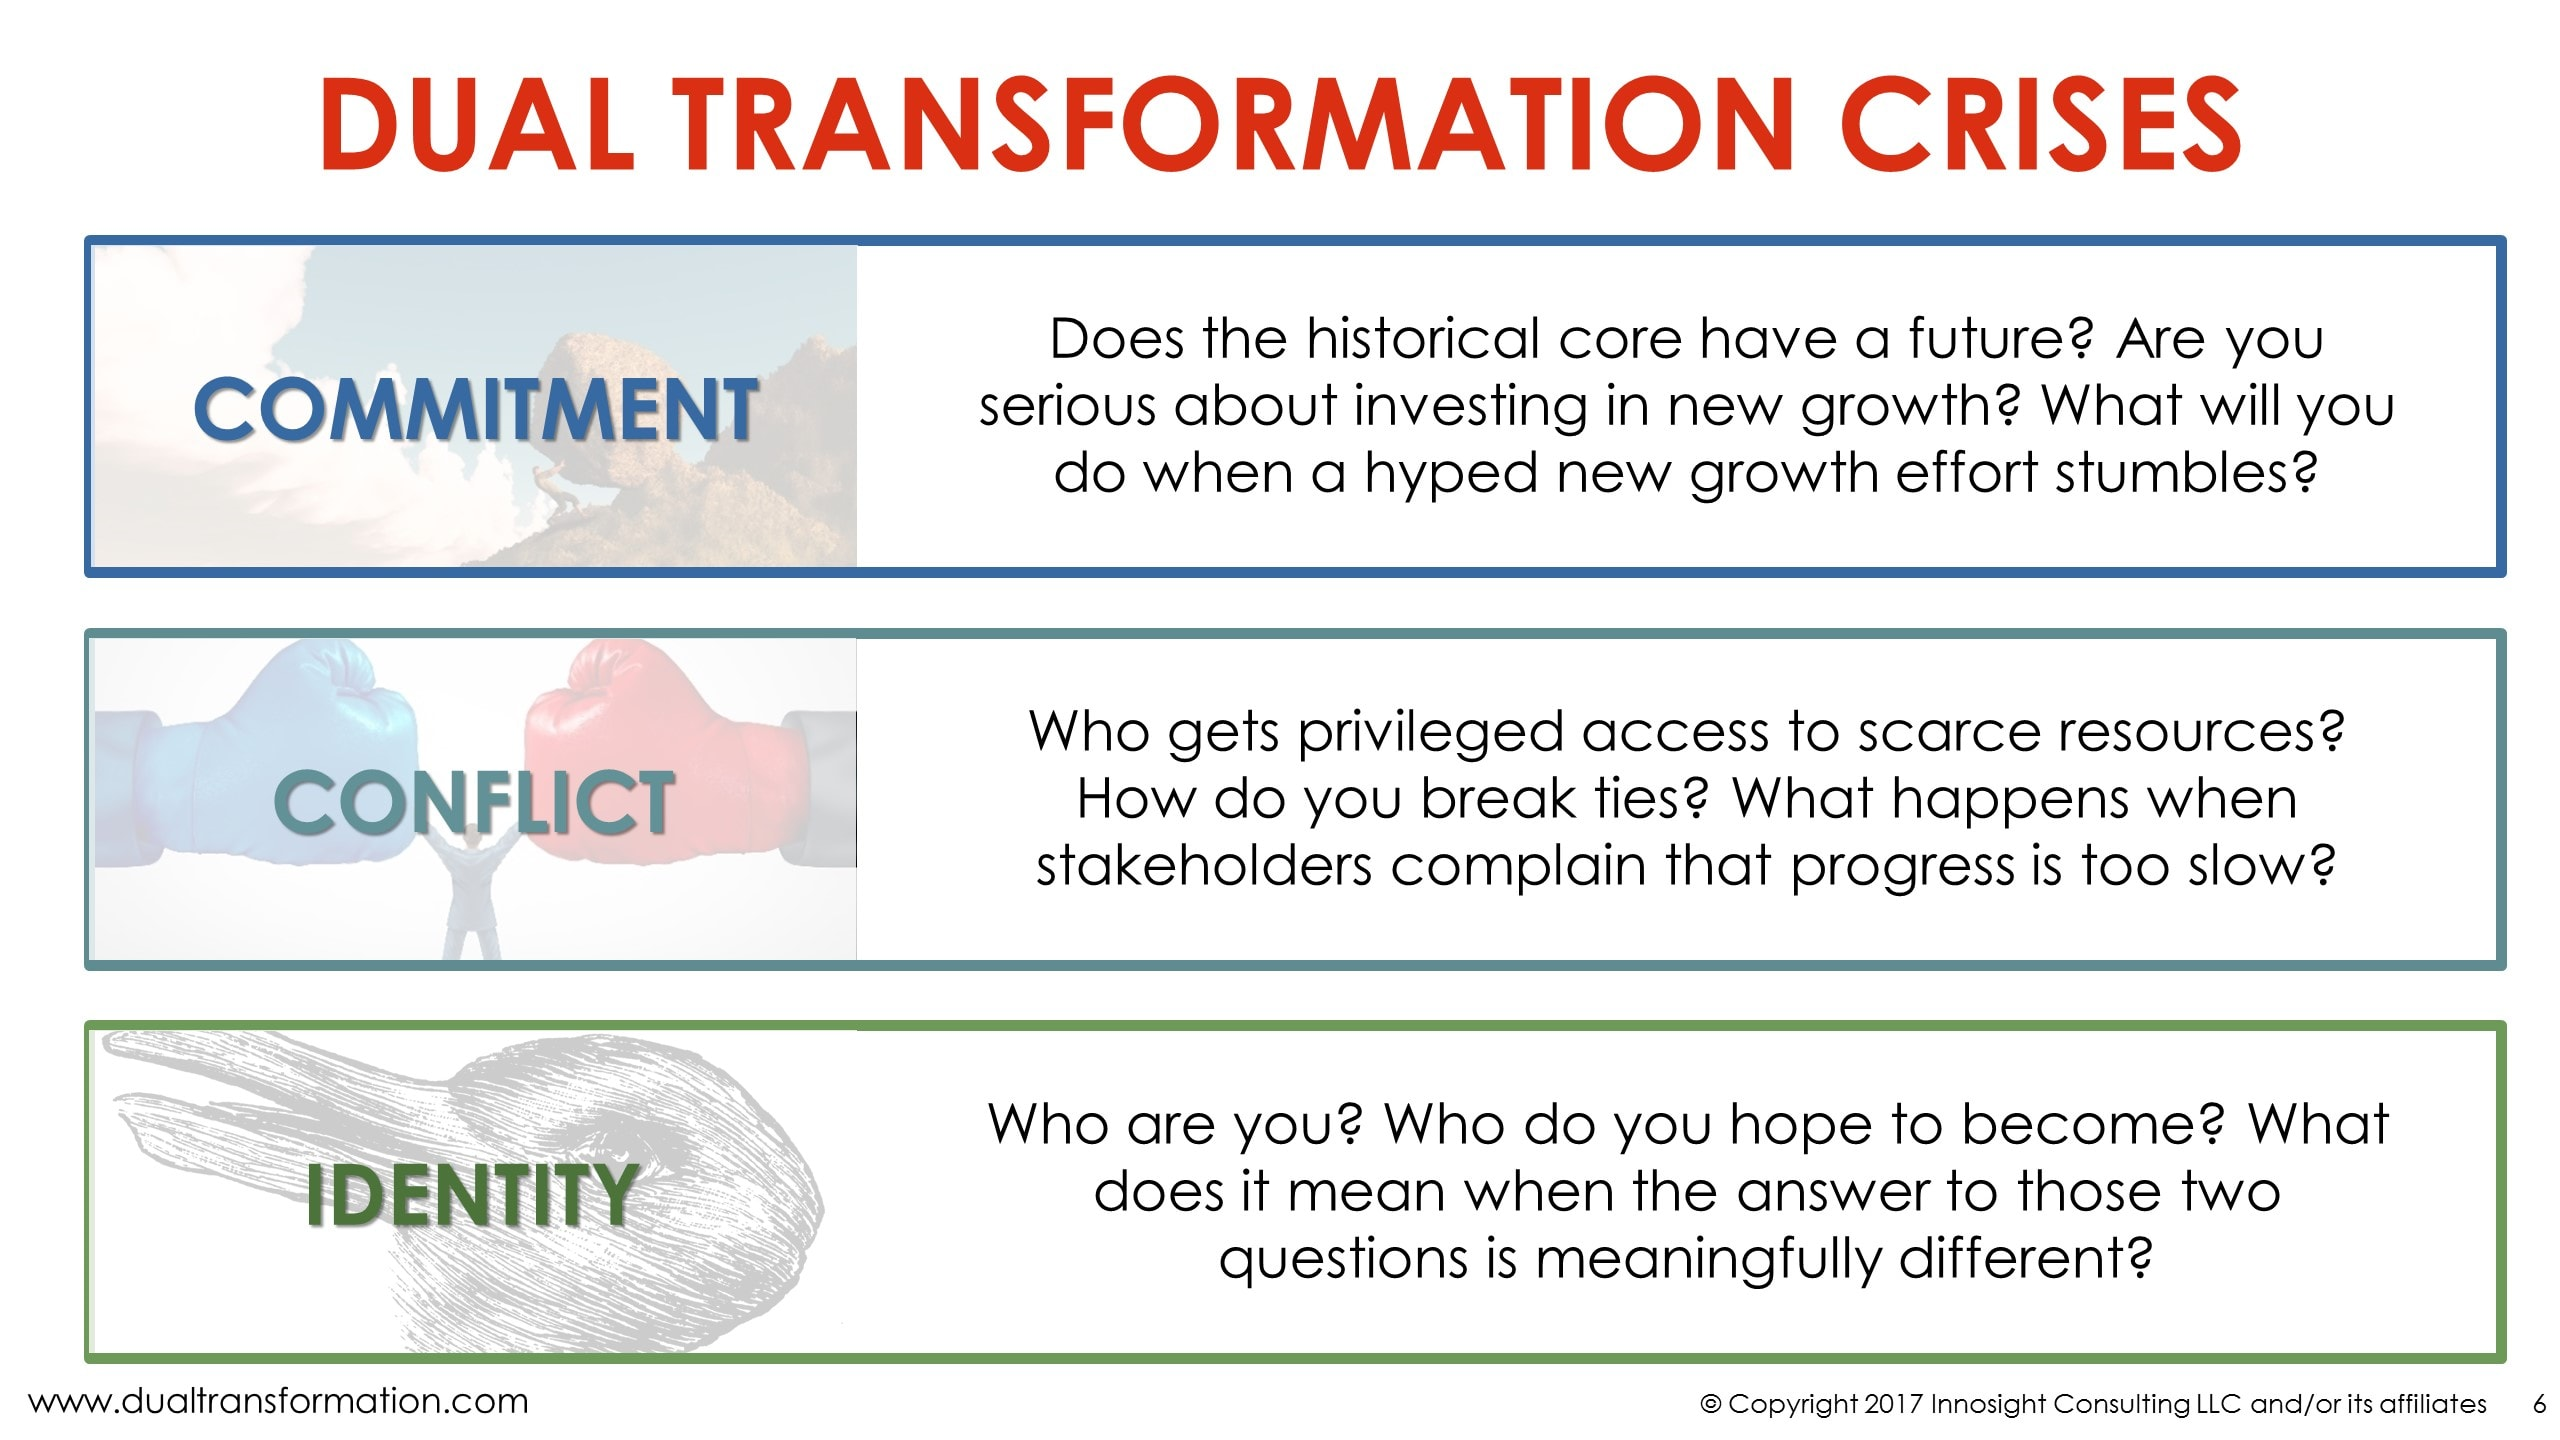 Leading Dual Transformation Slide 5